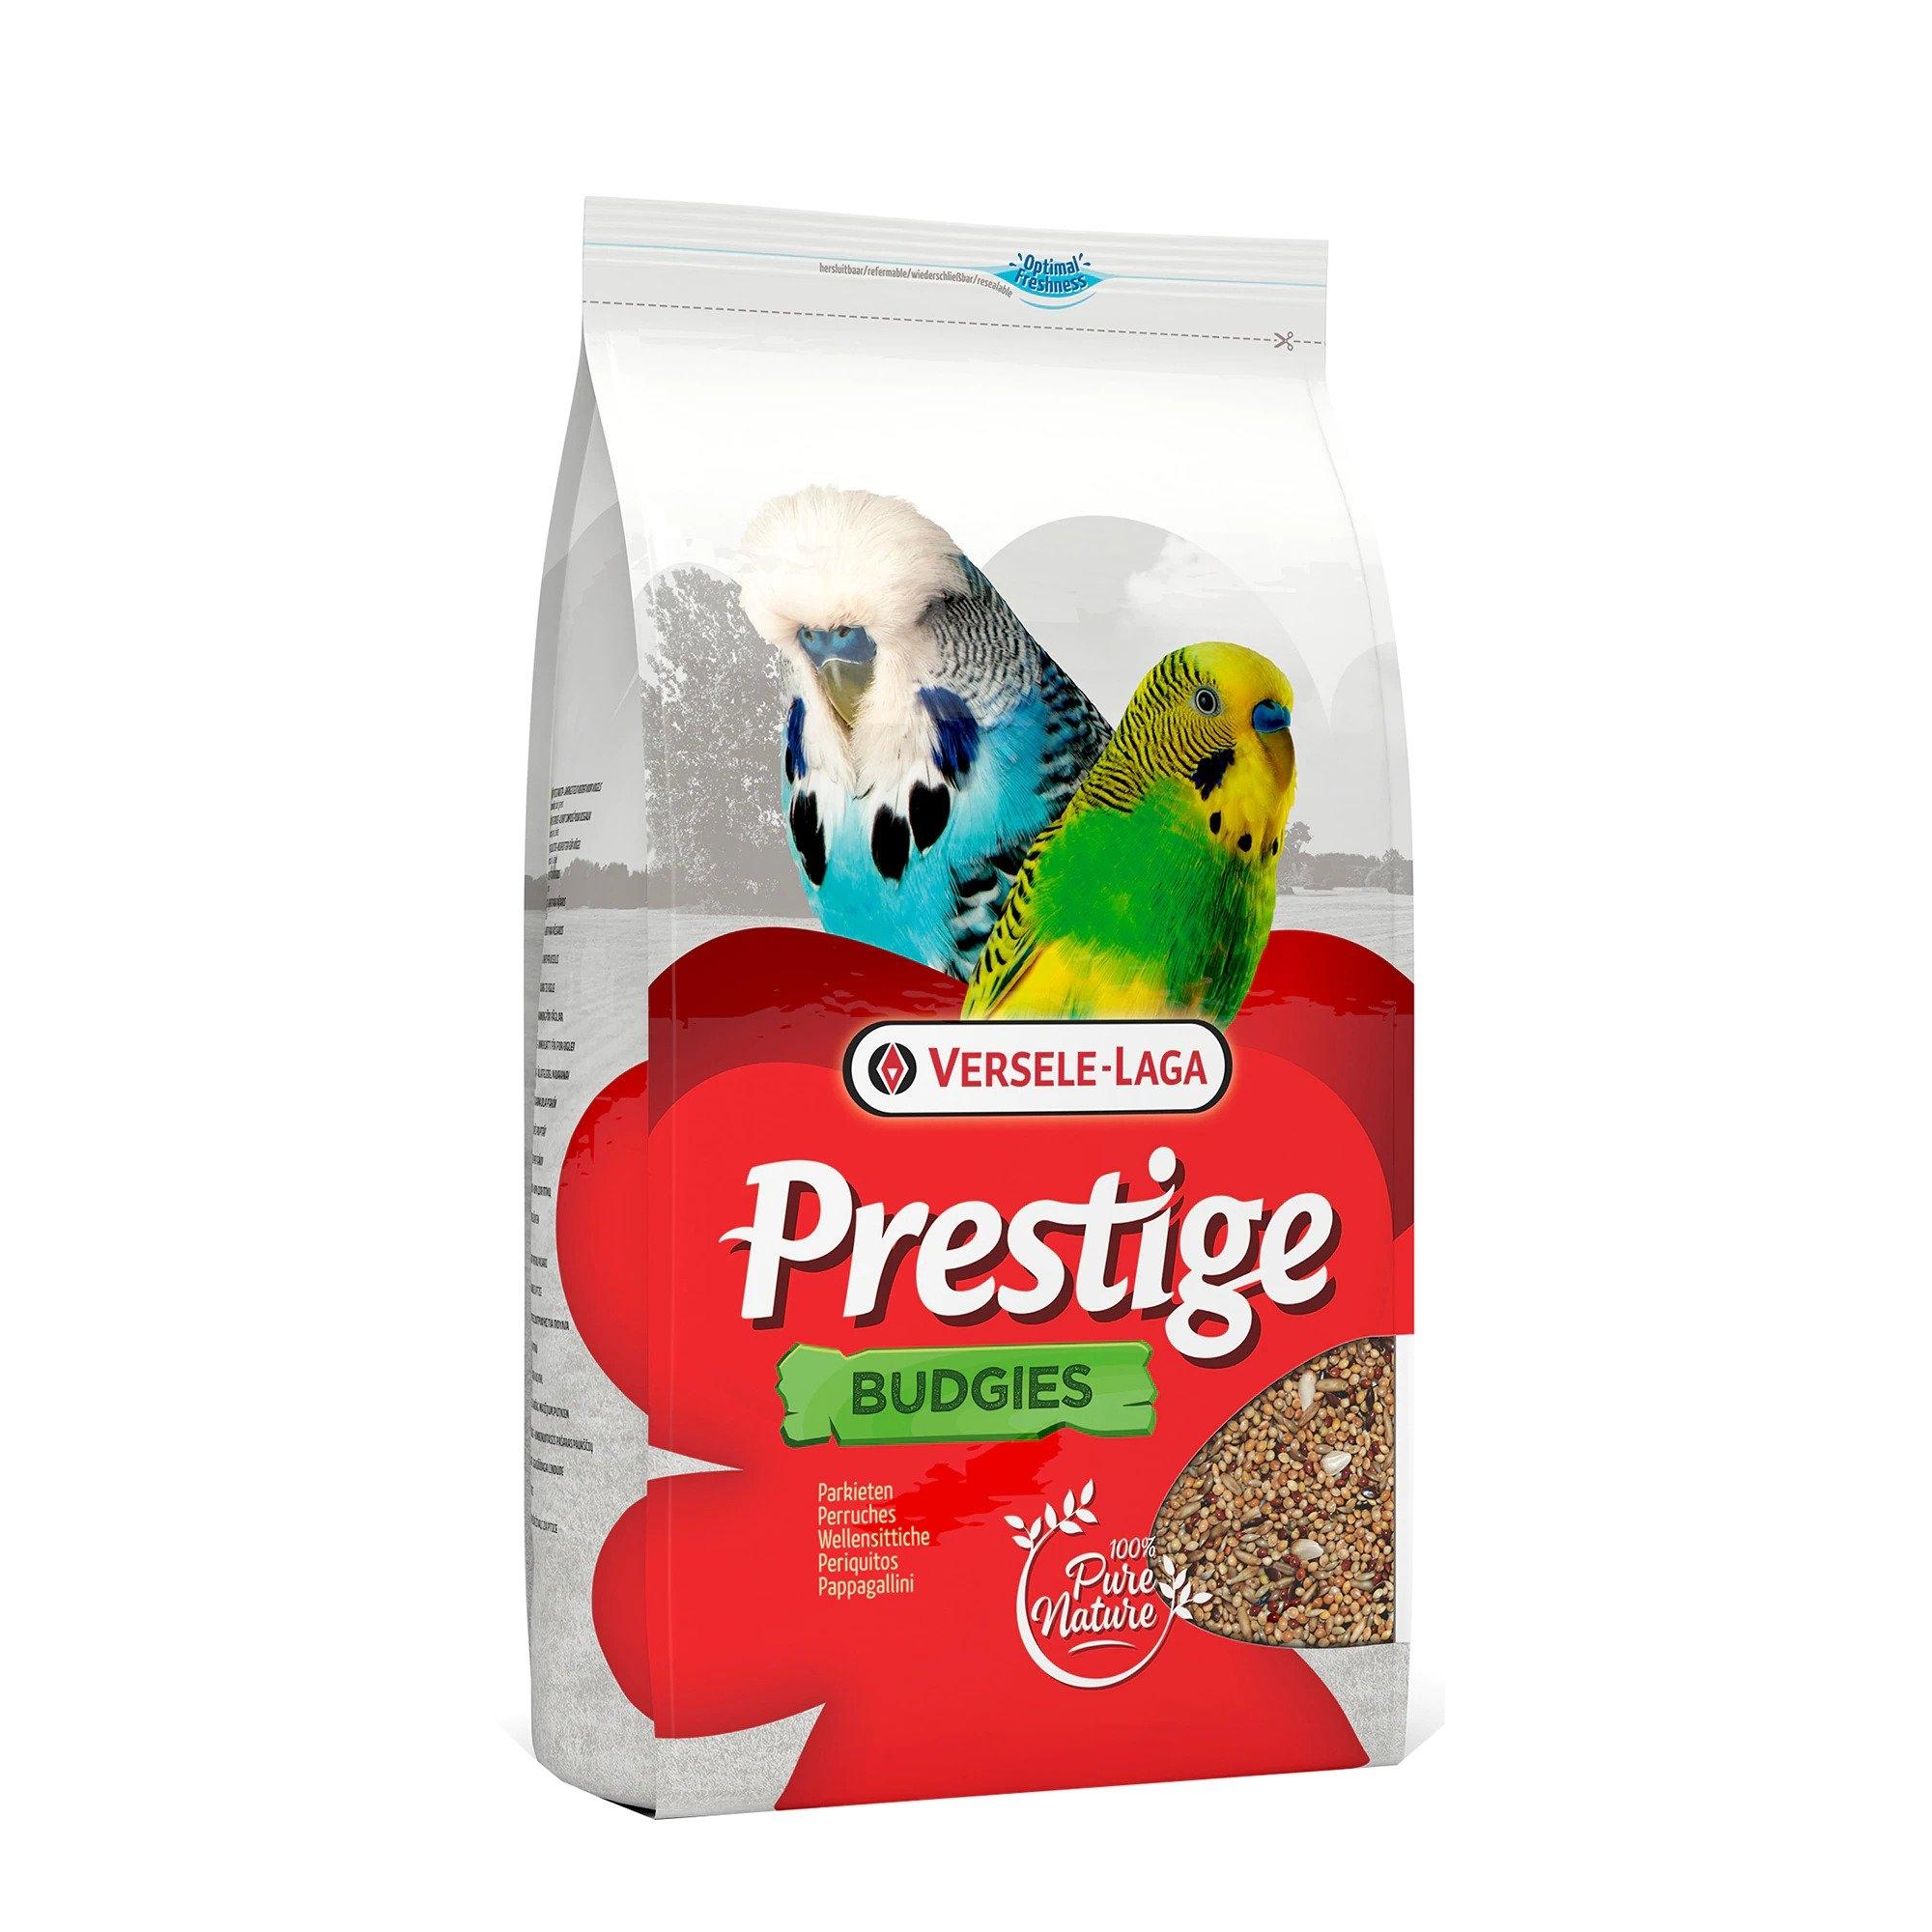 Meniu perusi, Versele-Laga Prestige, 20 kg imagine